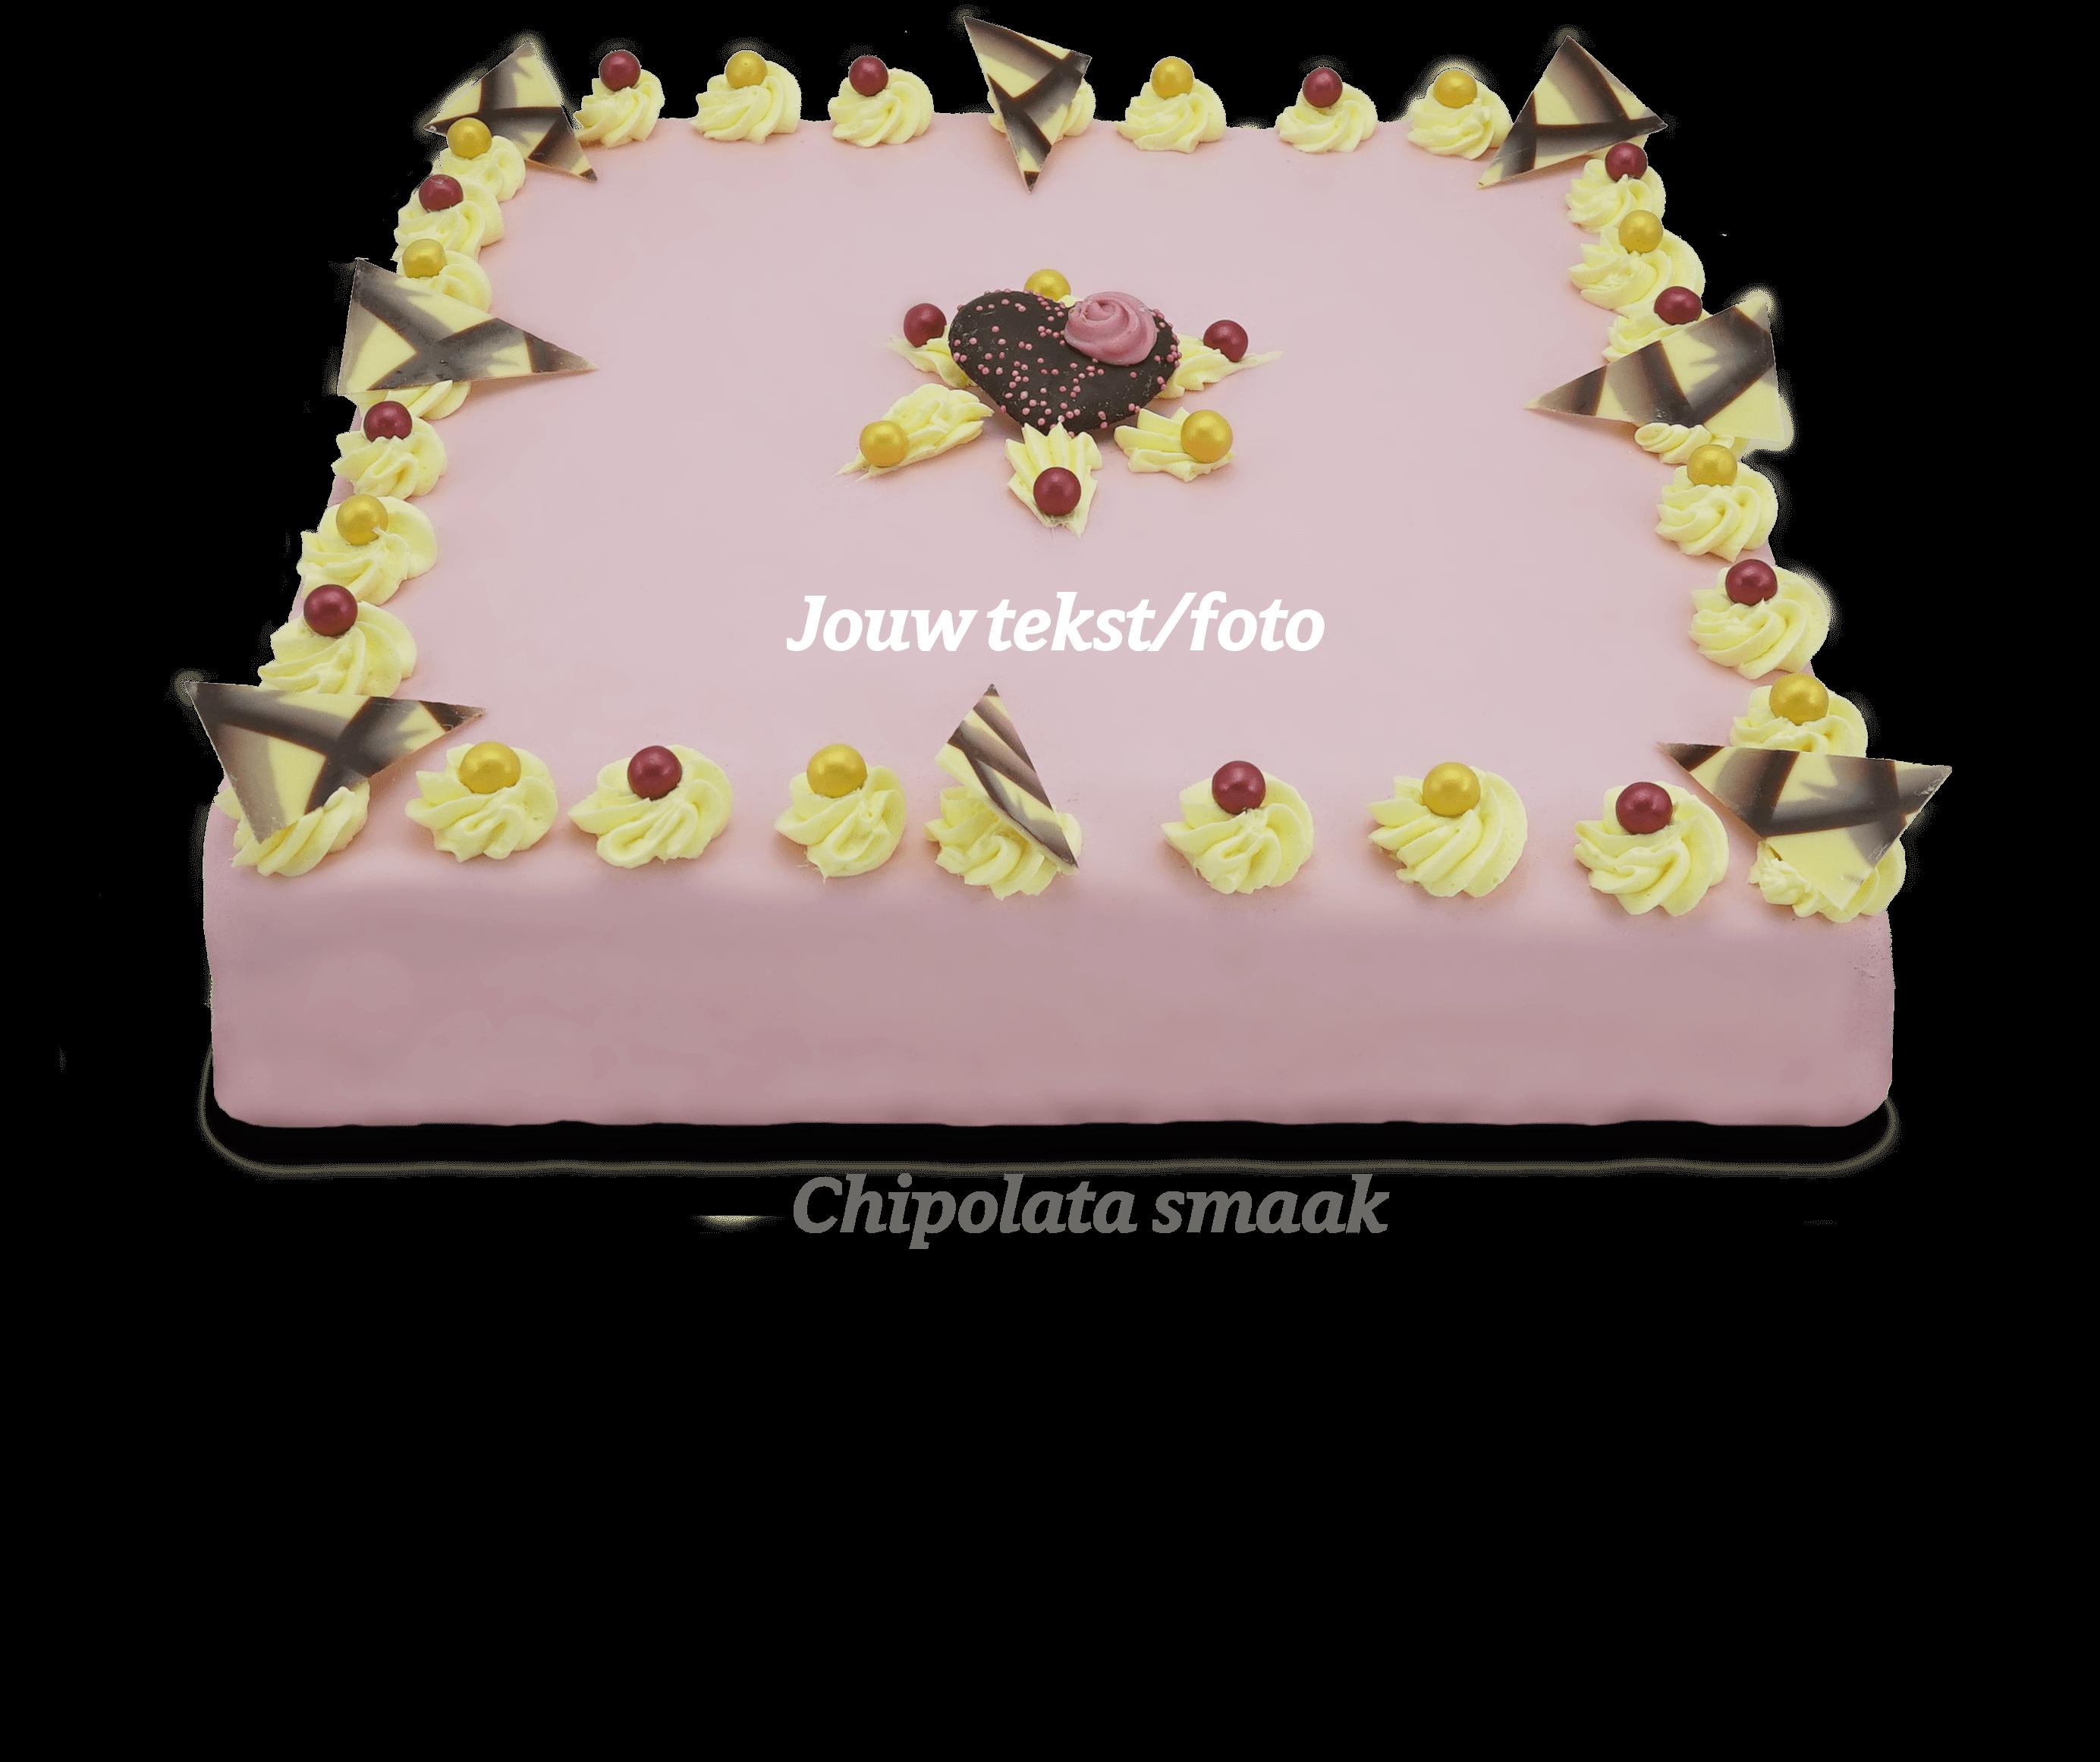 Chipolata taart foto taart bakkerij kwakman 1